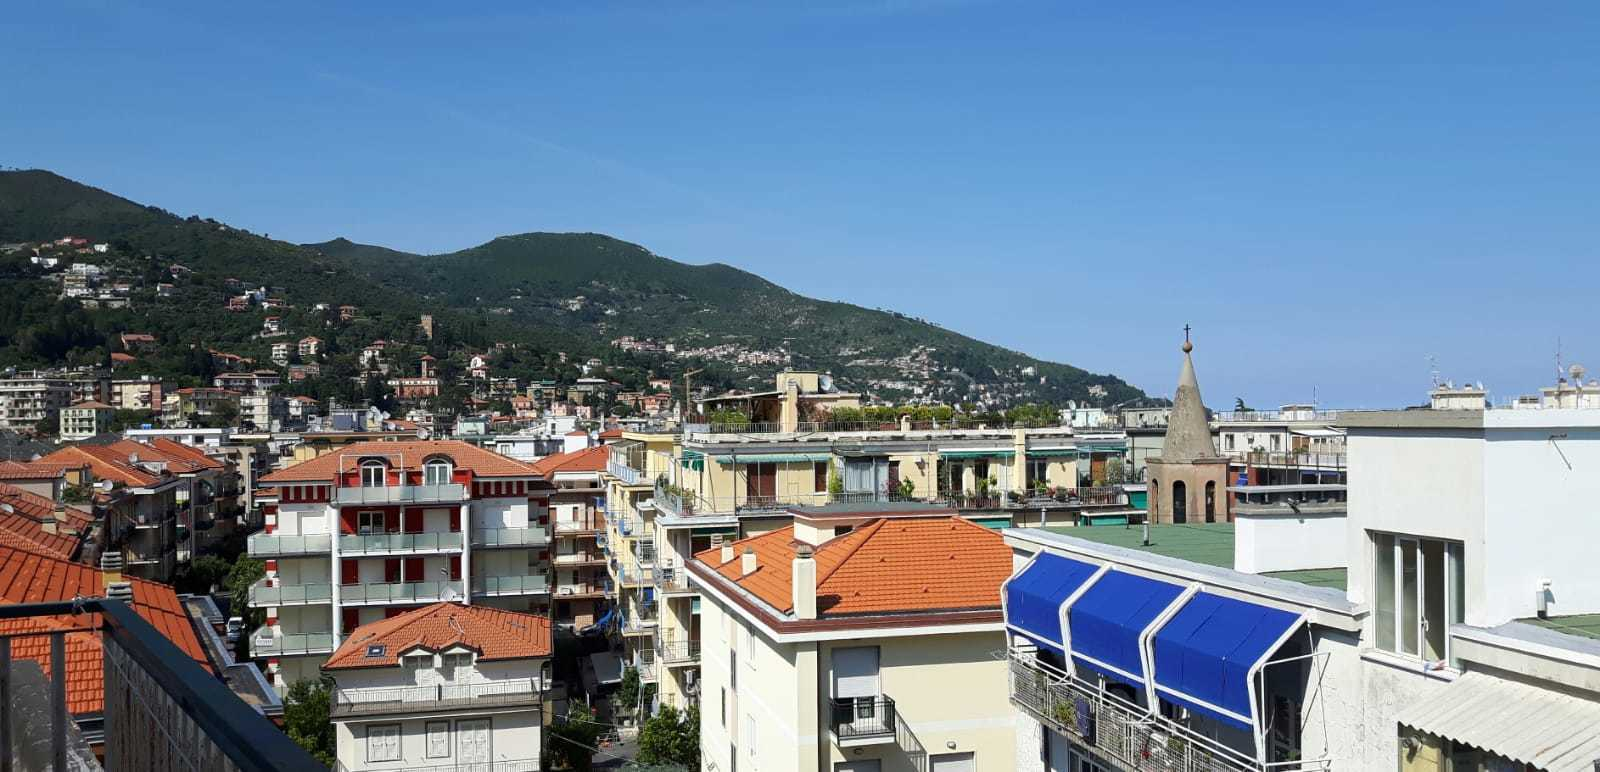 Attico Via San Pancrazio 5A313